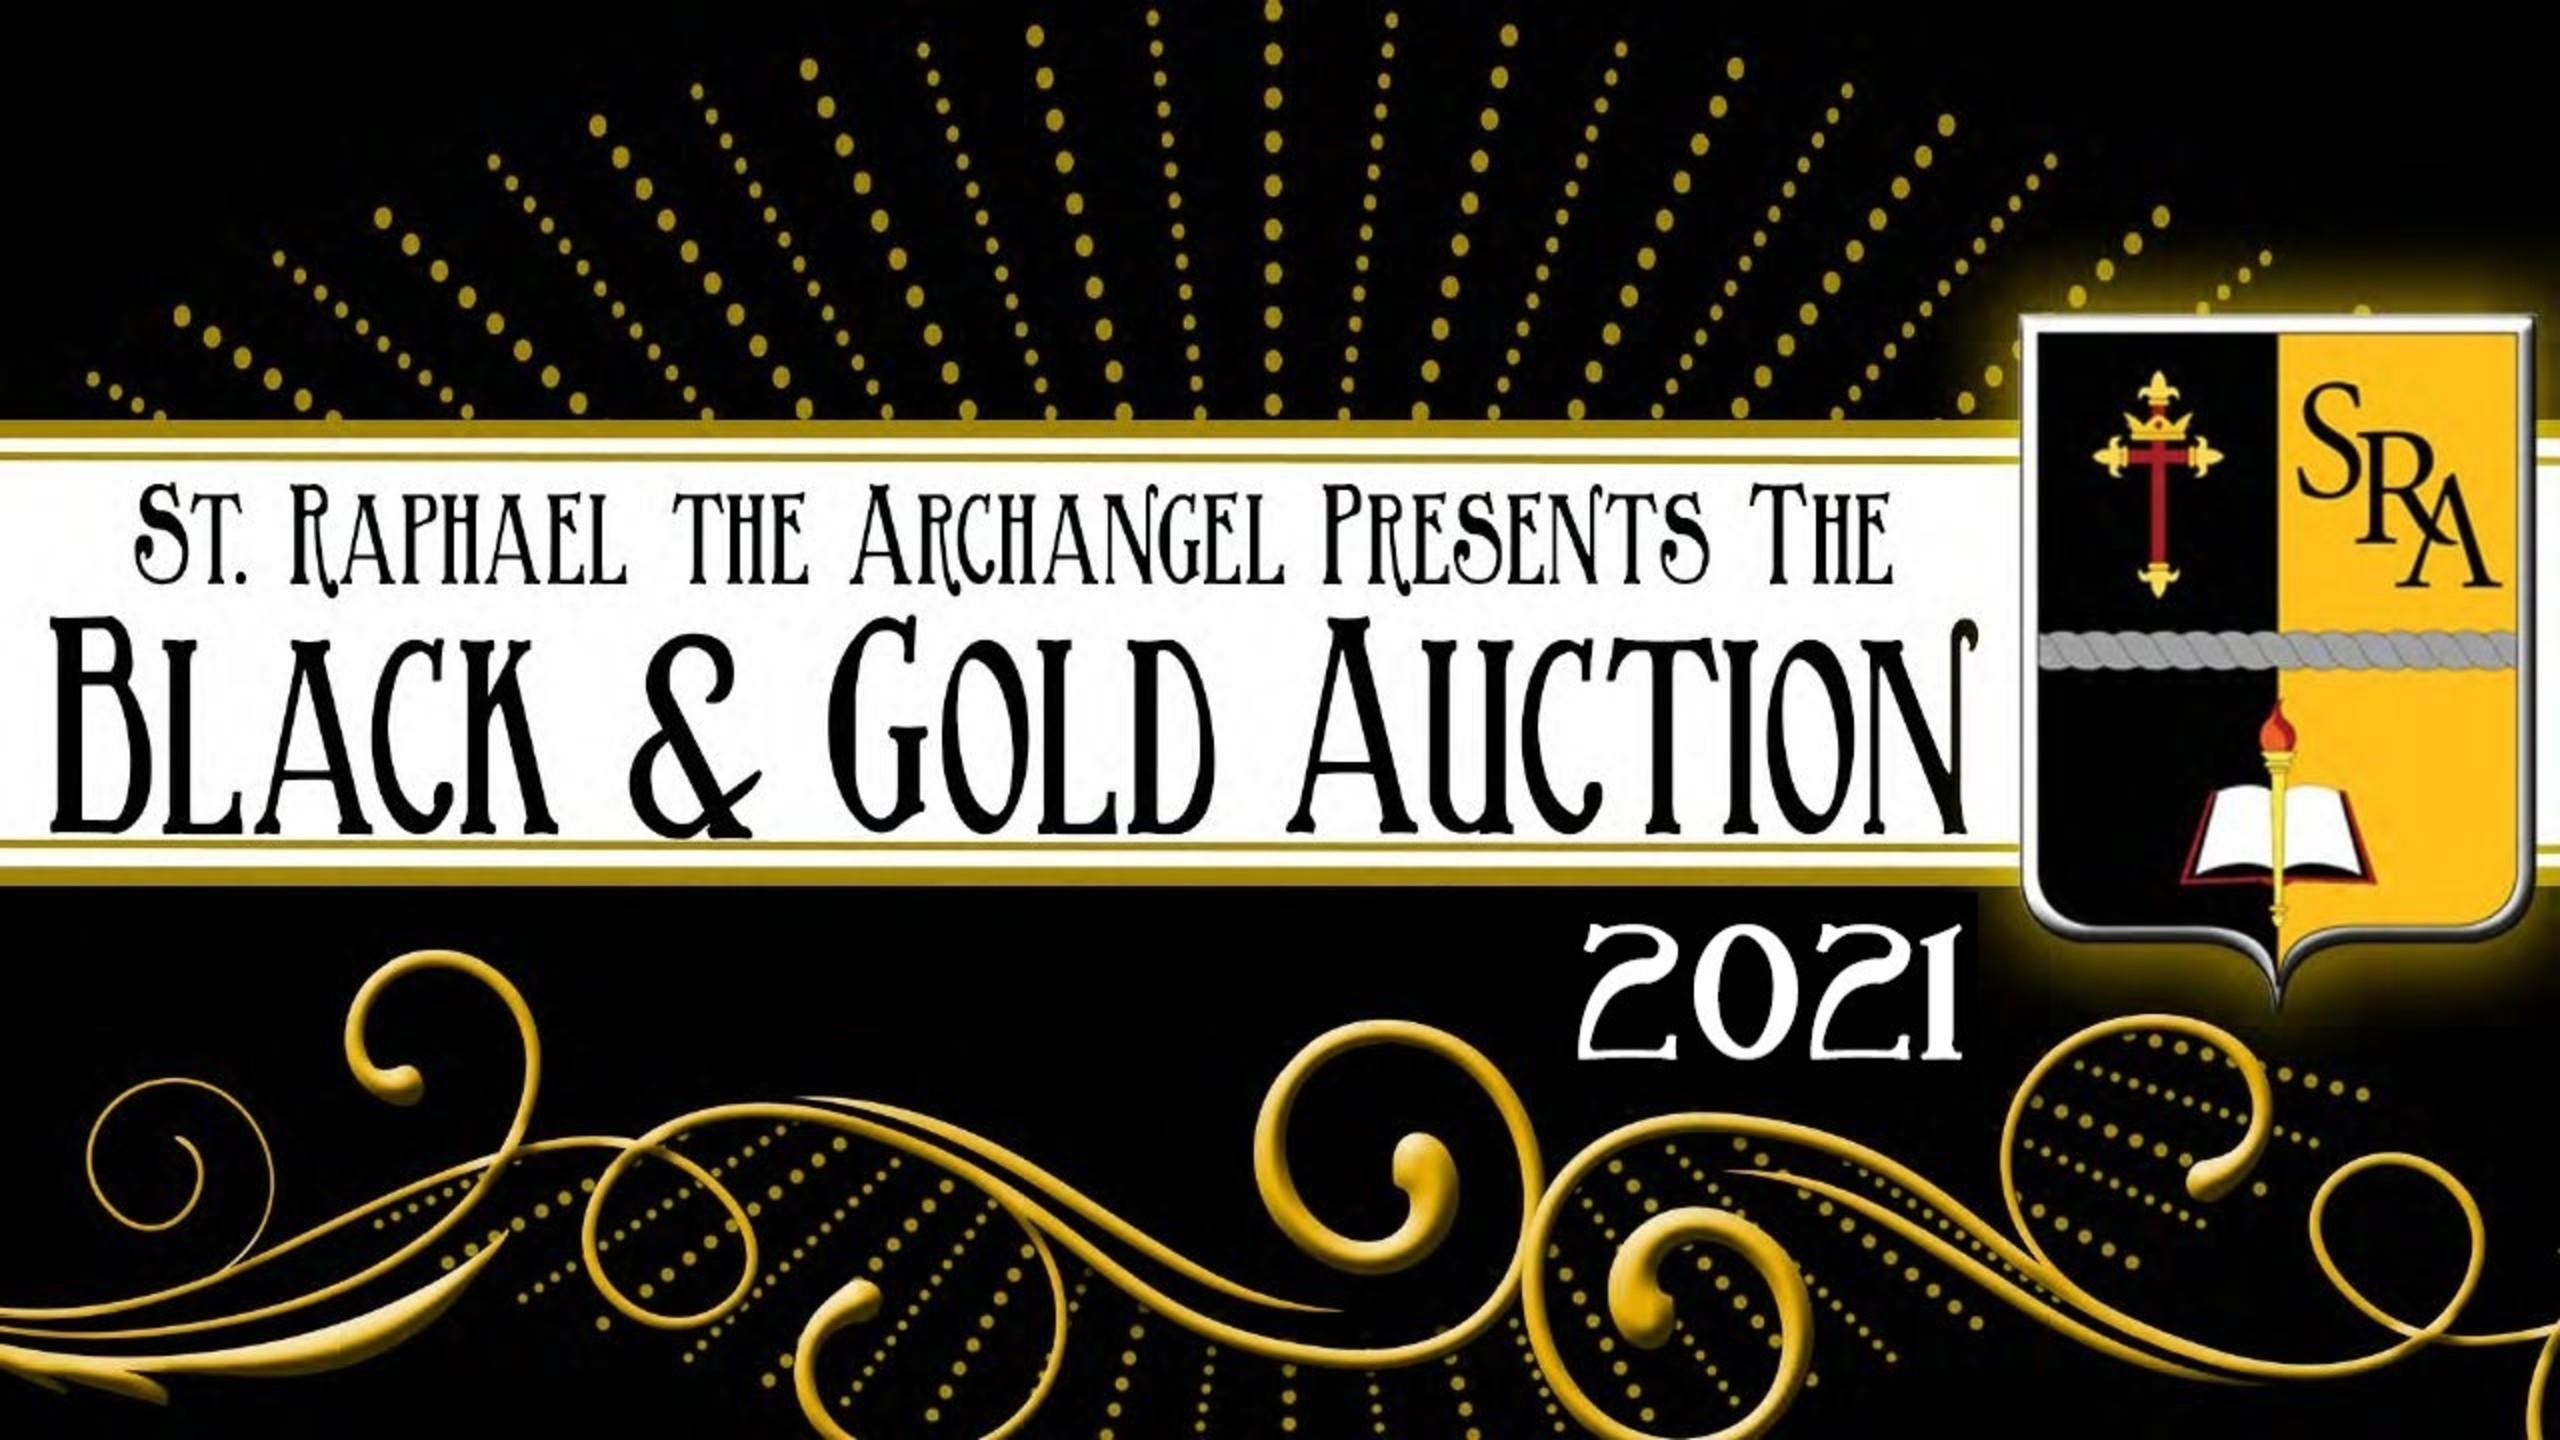 2021 Bg Auction 2